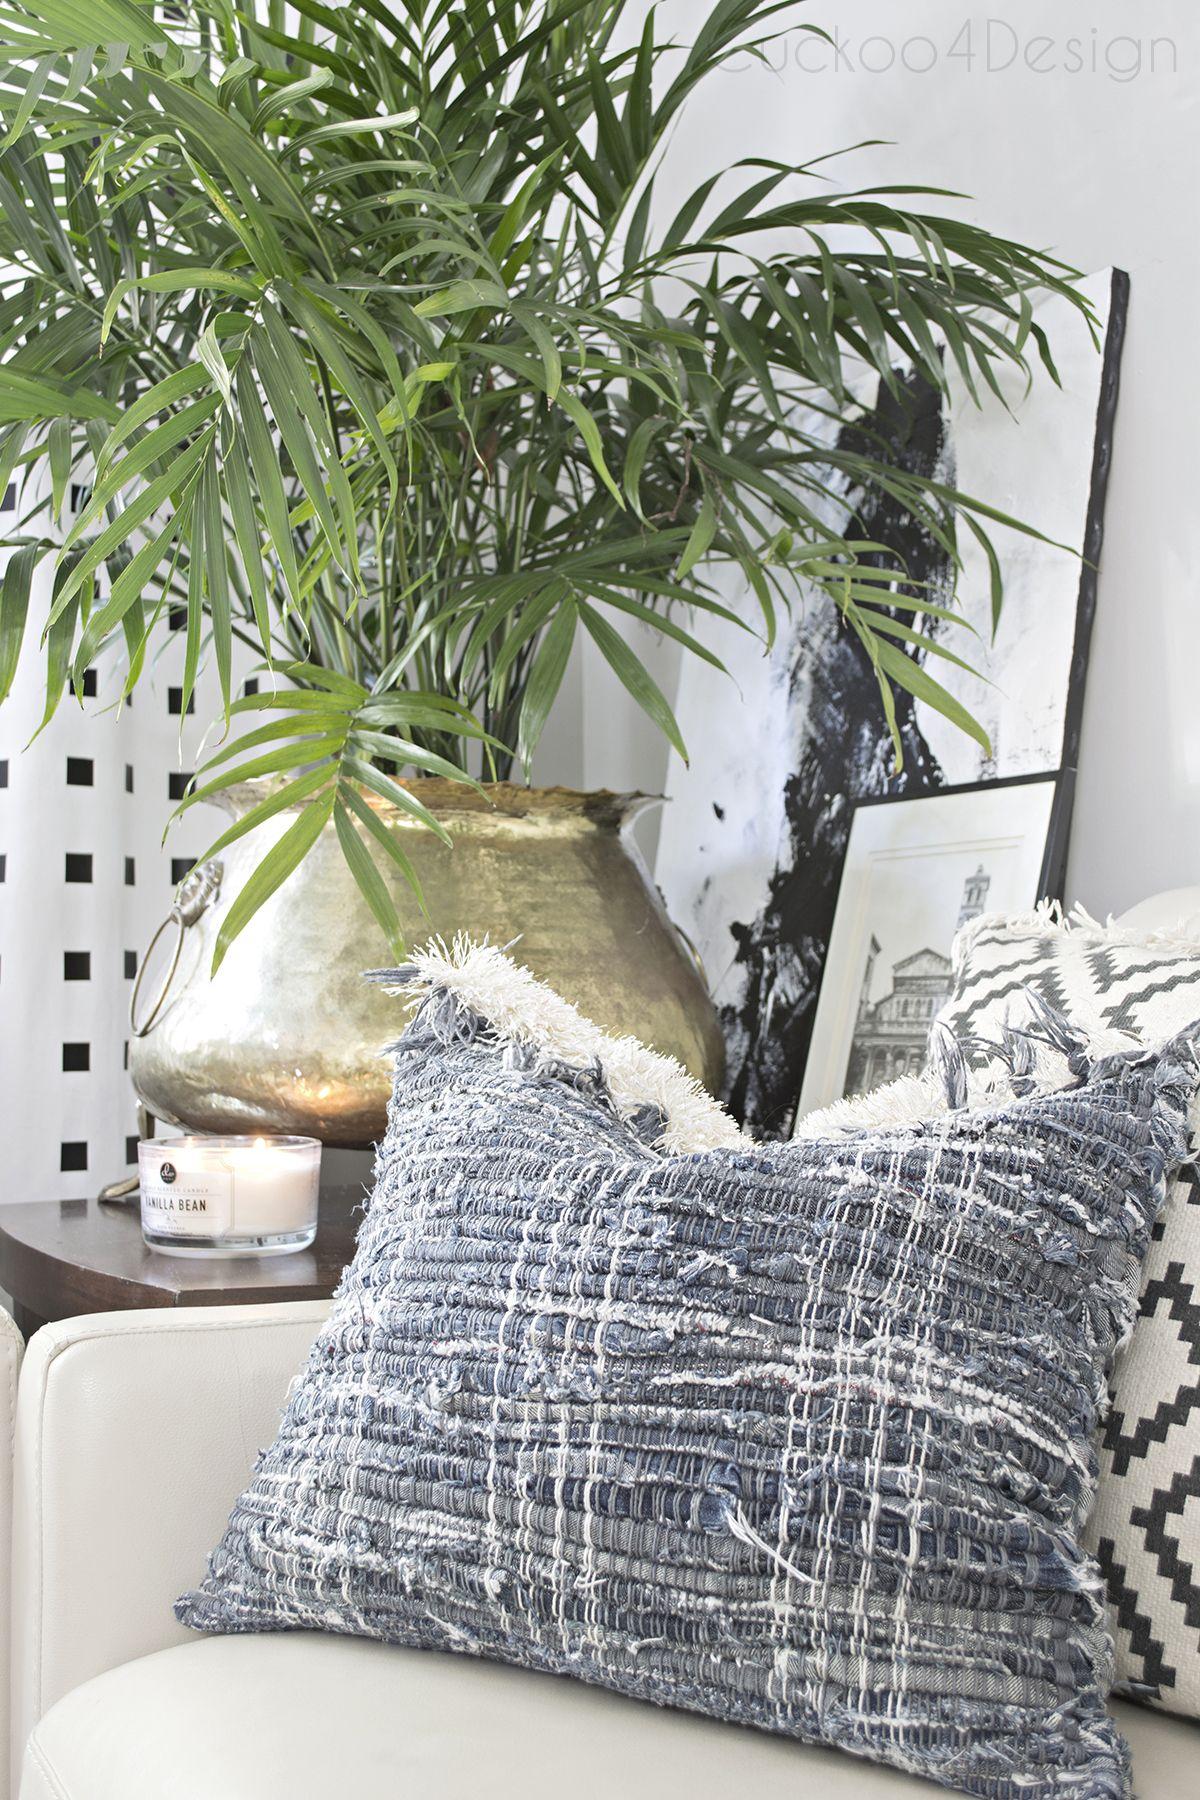 Natural Modern Fall Decor For Blogger Stylin Home Tours Diy Pillow Covers Diy Pillows Modern Fall Decor